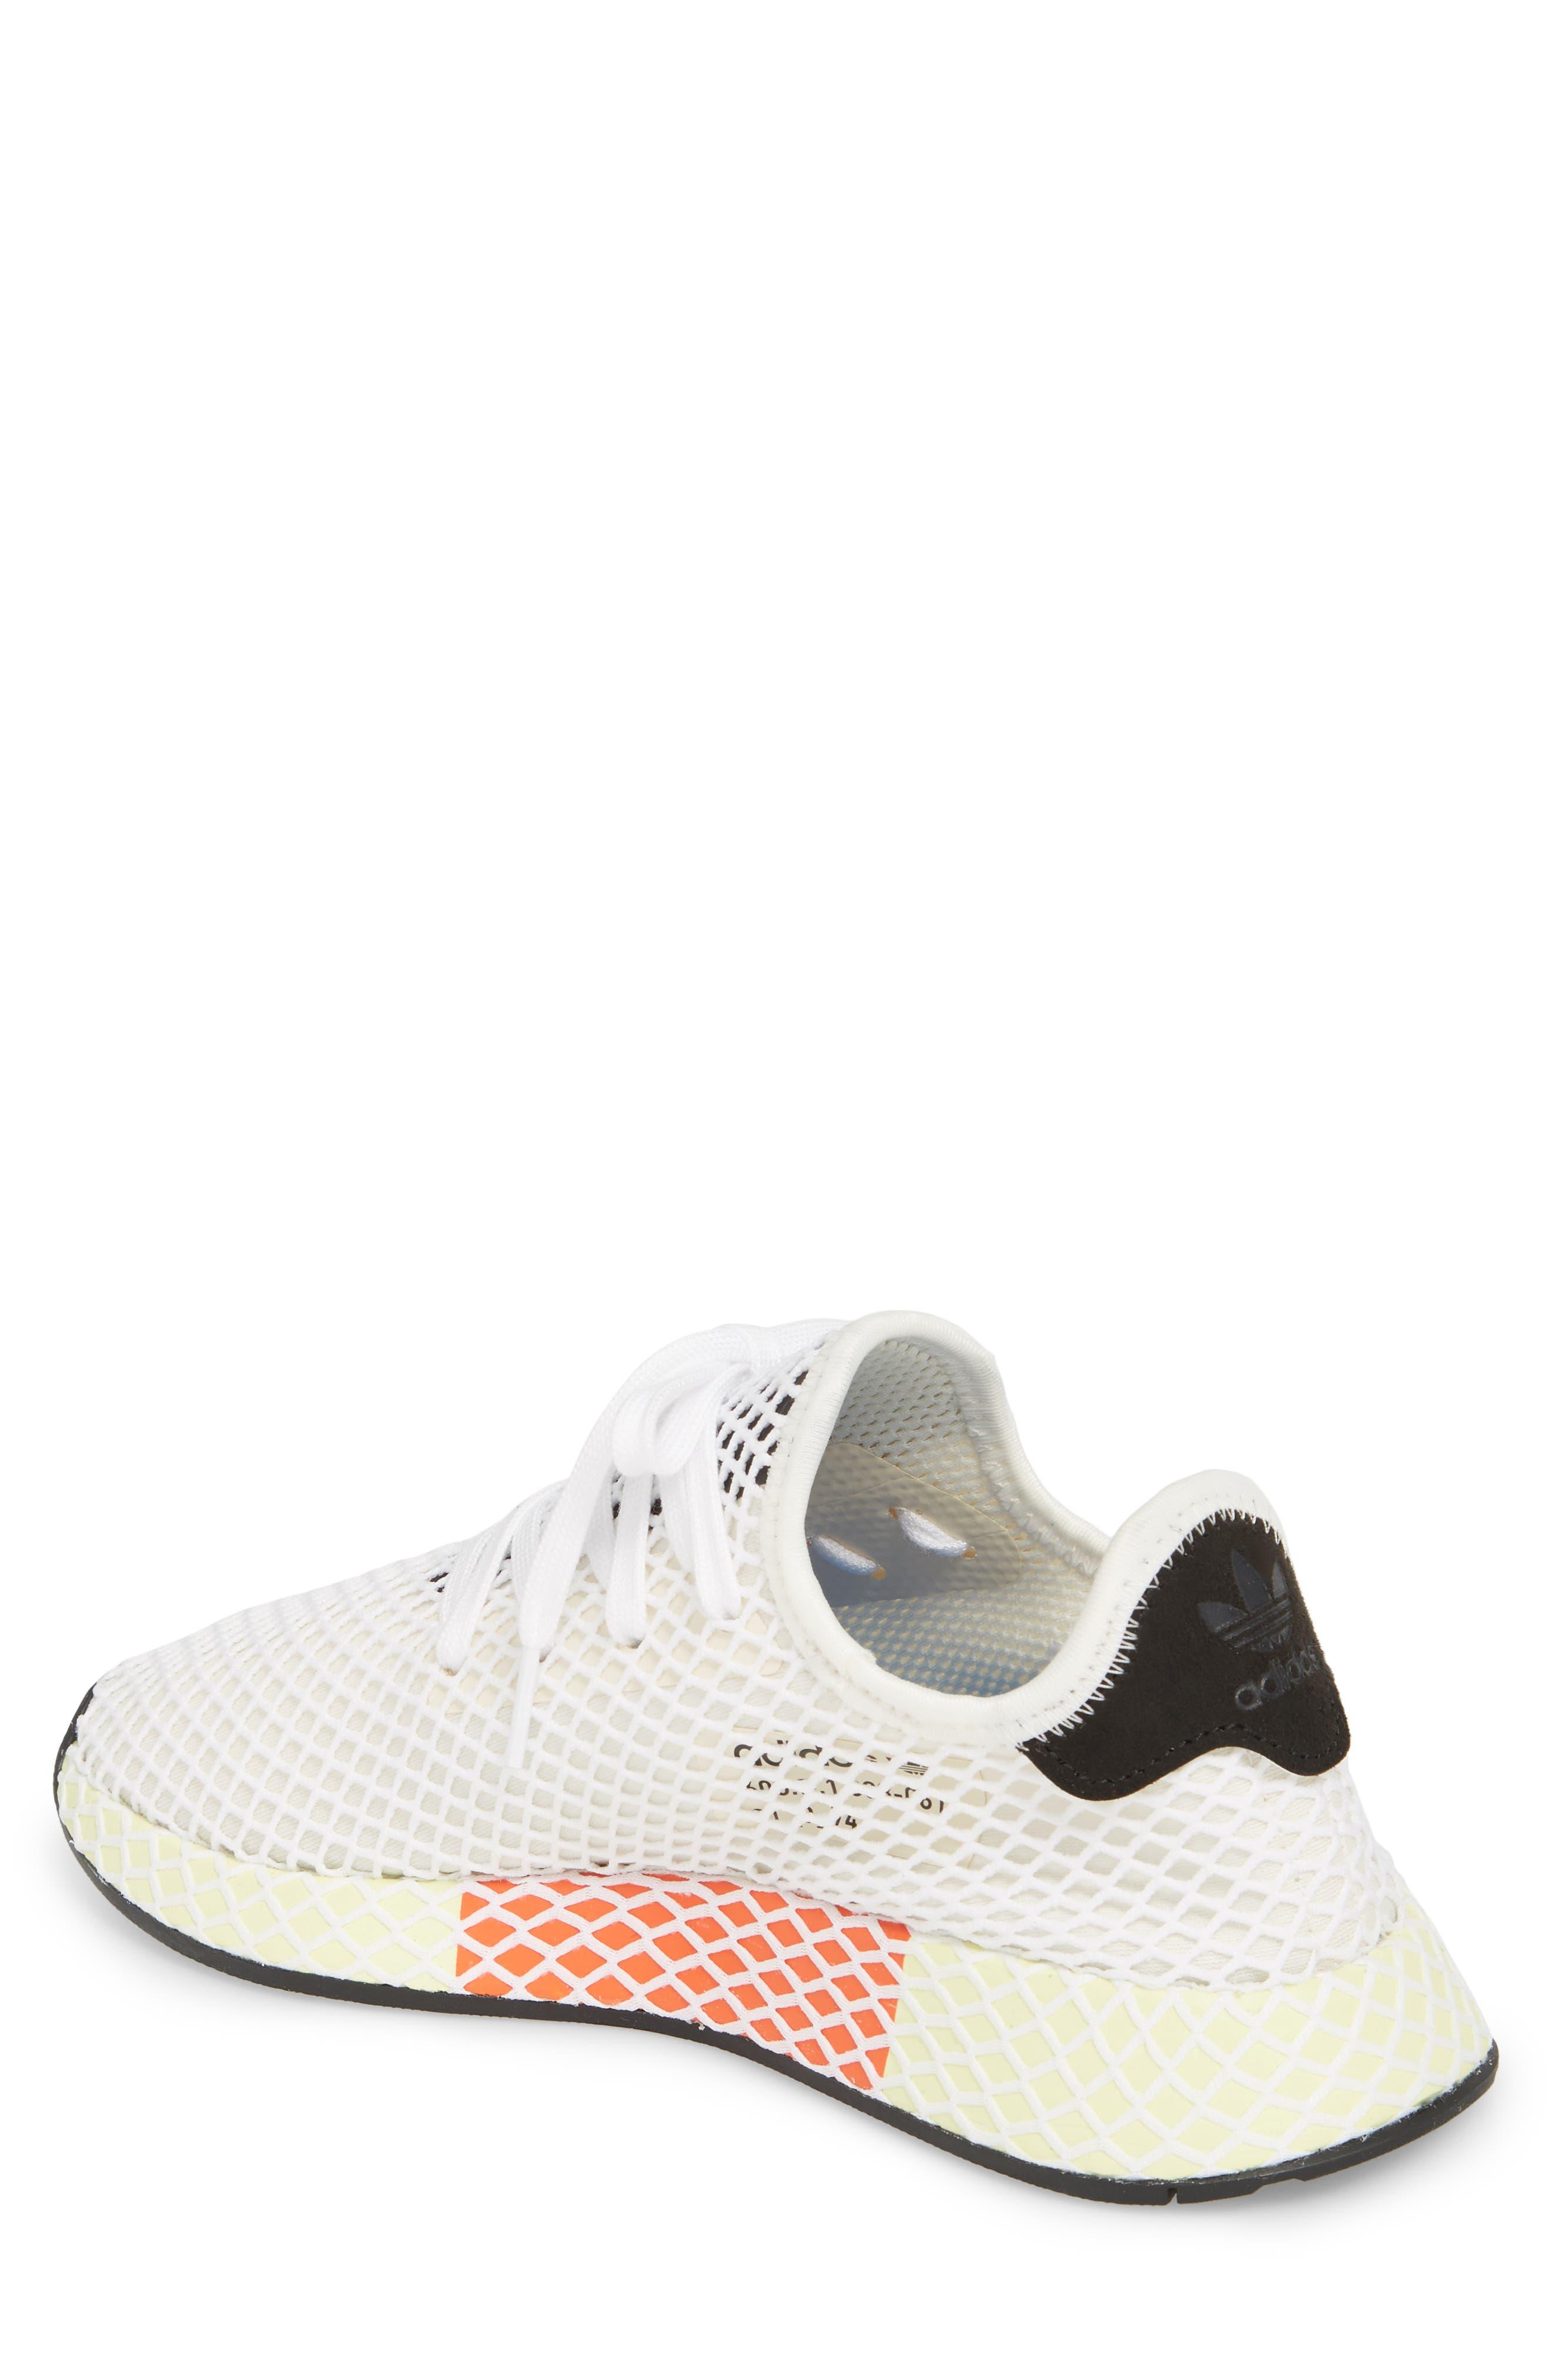 Deerupt Runner Sneaker,                             Alternate thumbnail 21, color,